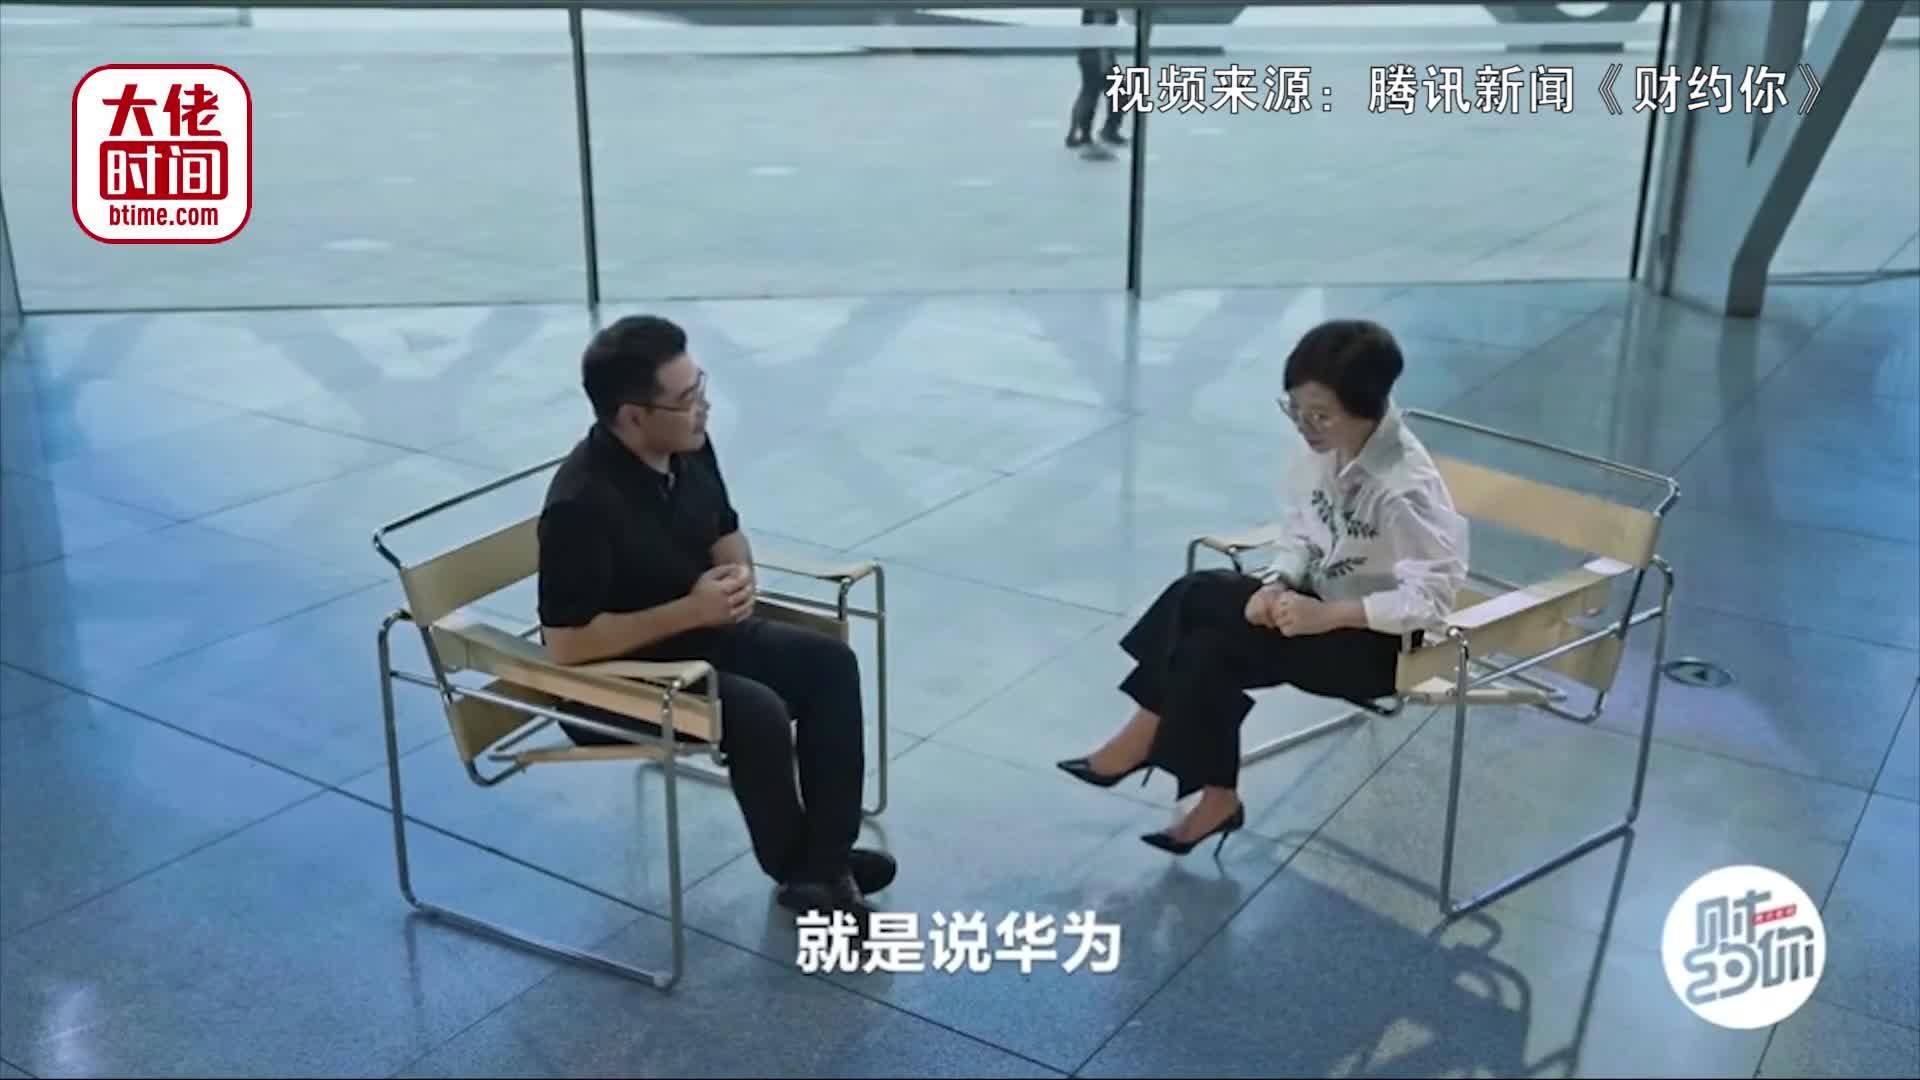 OPPO副总裁刘波:国内高端市场目前只有苹果华为,希望成为第三个玩家